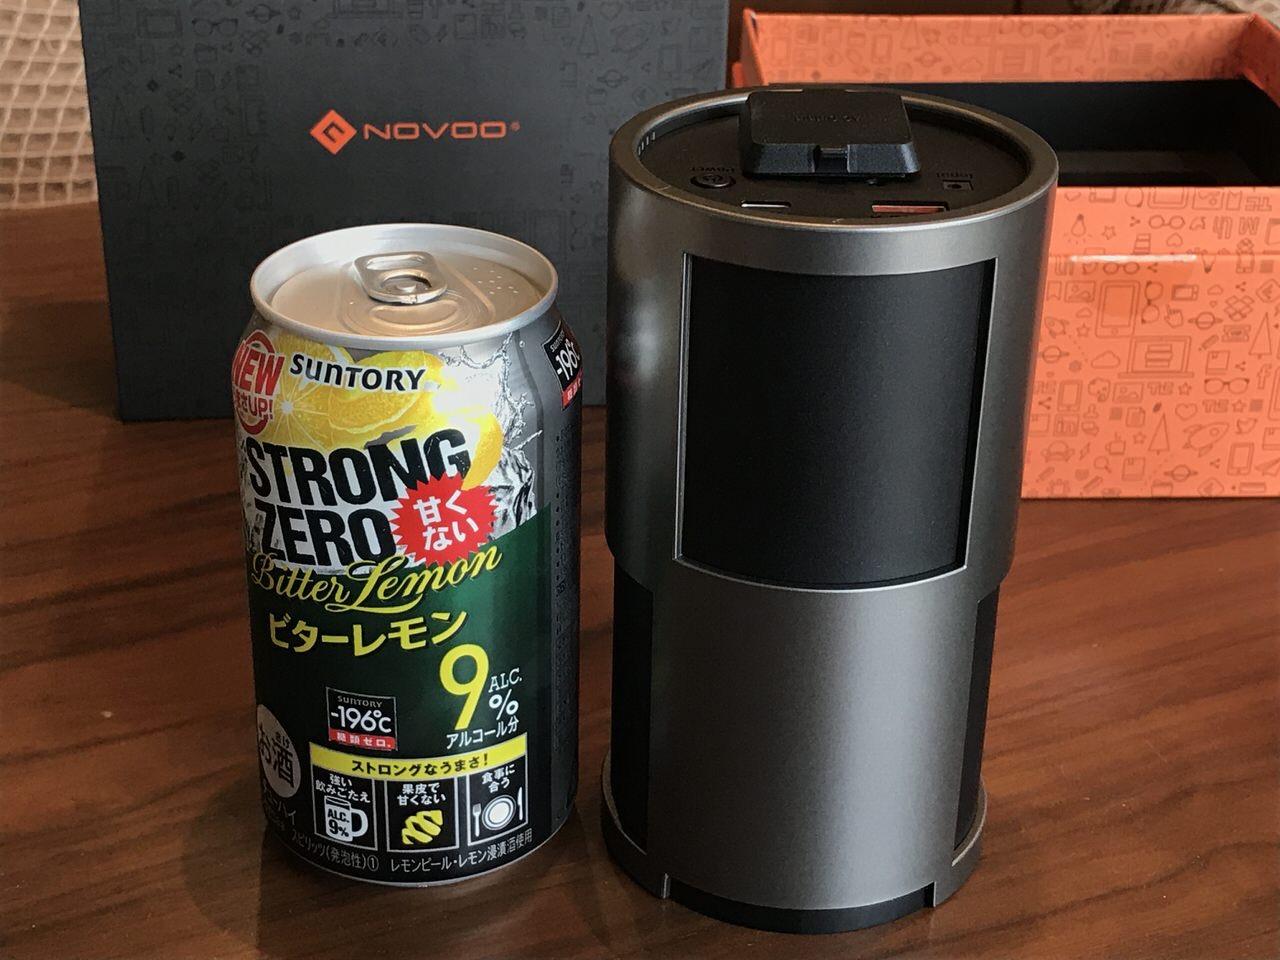 「NOVOO」350ml缶と比較